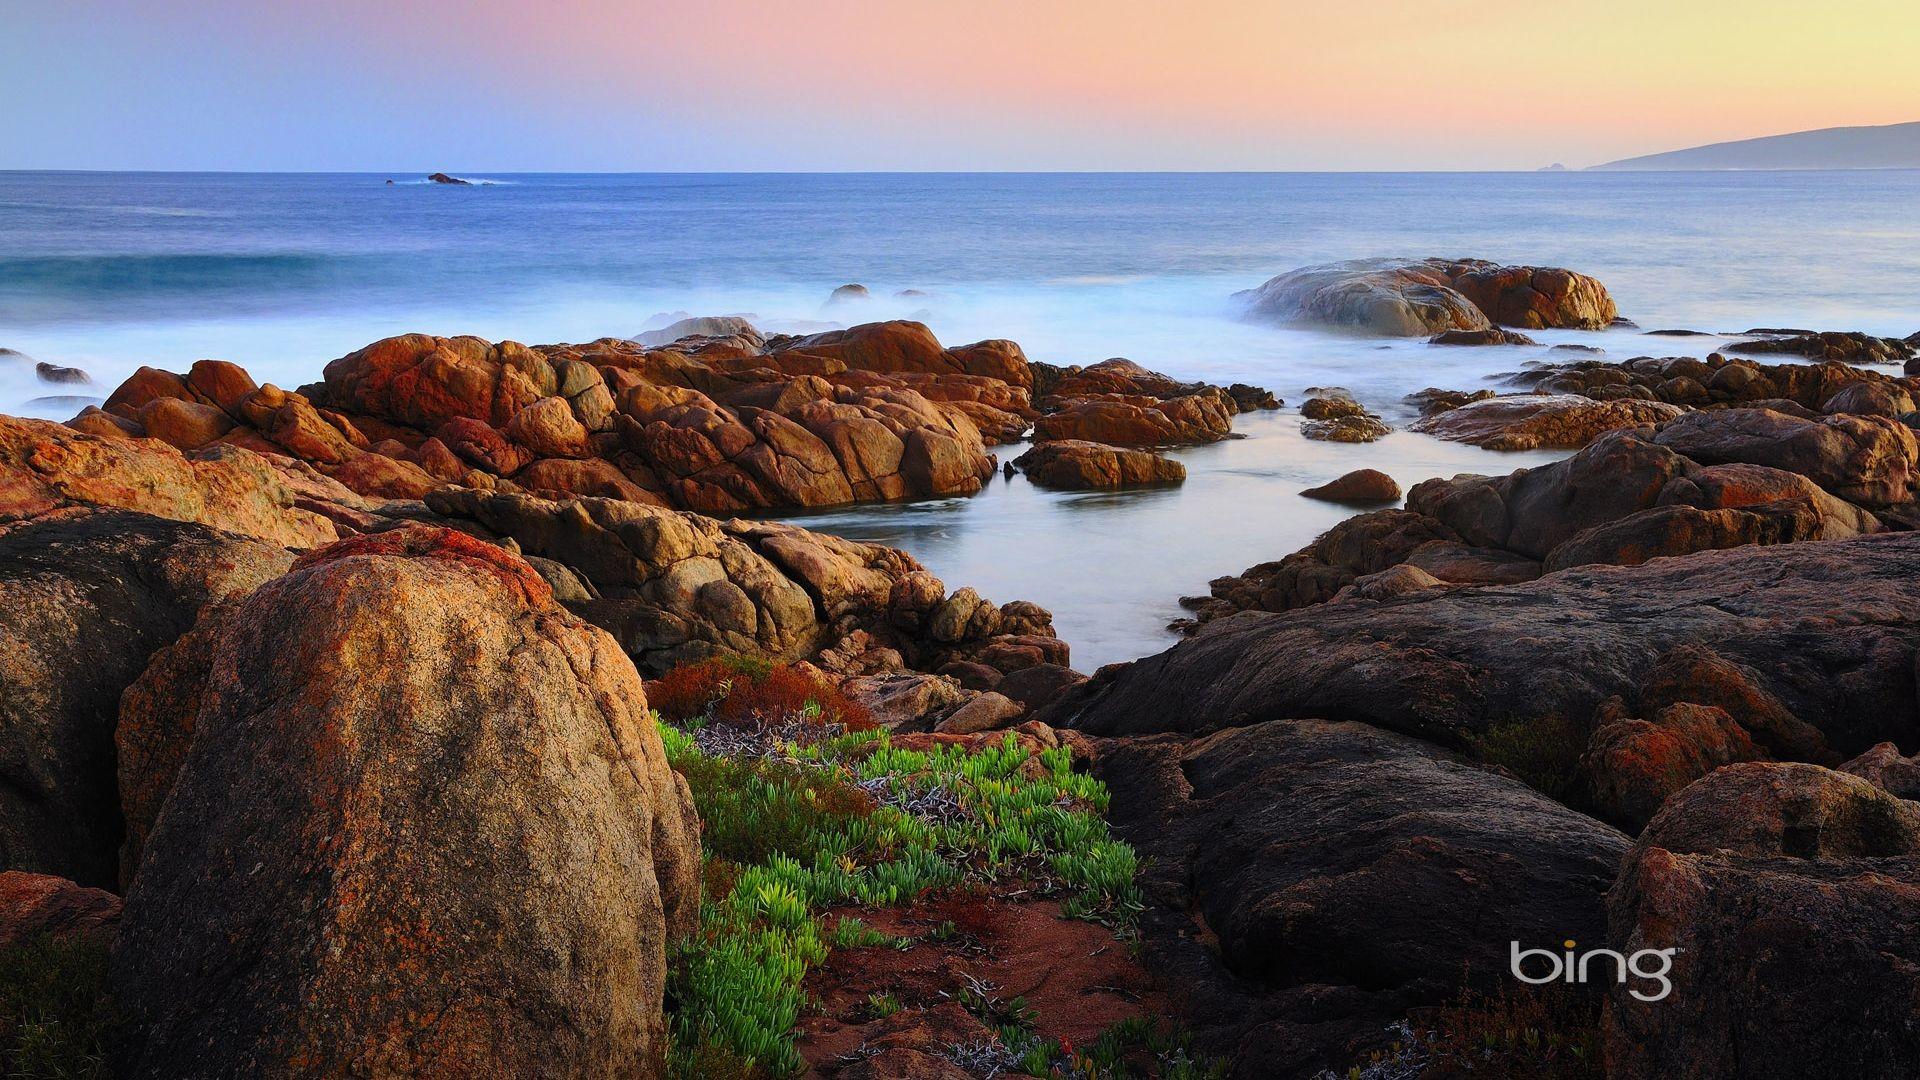 Res: 1920x1080, Australia Canal Rocks. Bing. [Desktop wallpaper ]